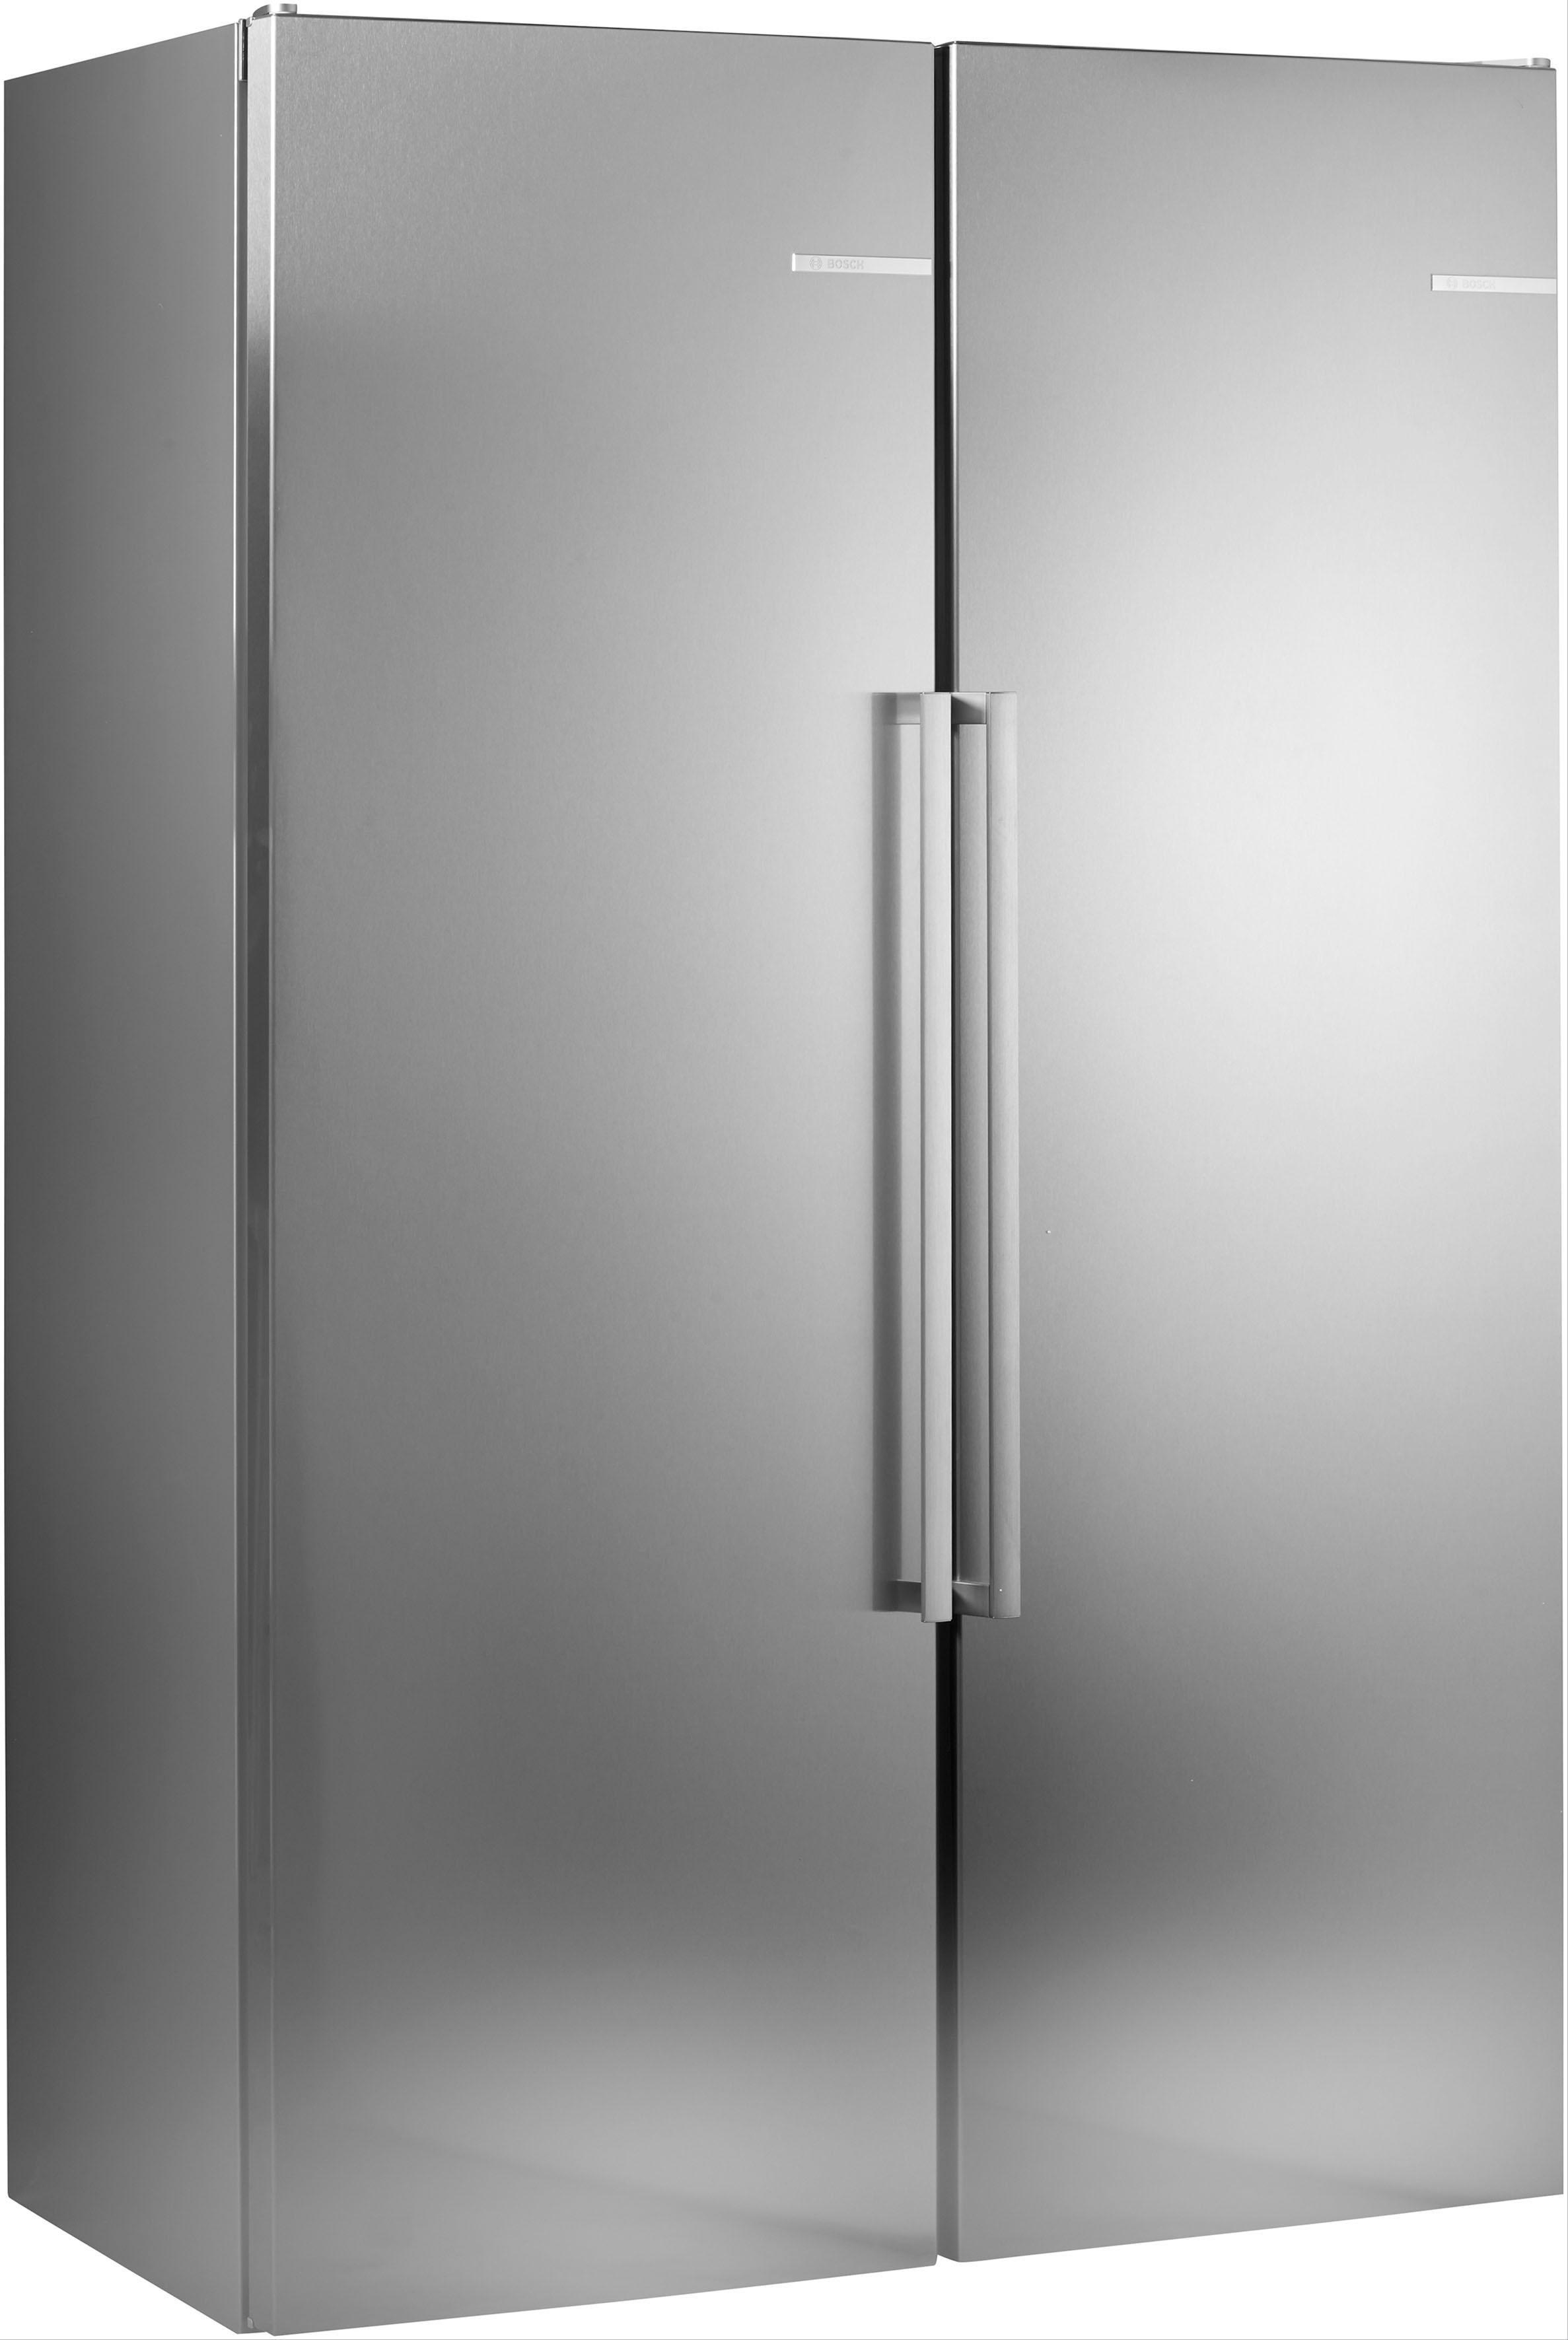 BOSCH side-by-side-koelkast serie 6, 186 cm hoog, 120 cm breed - verschillende betaalmethodes